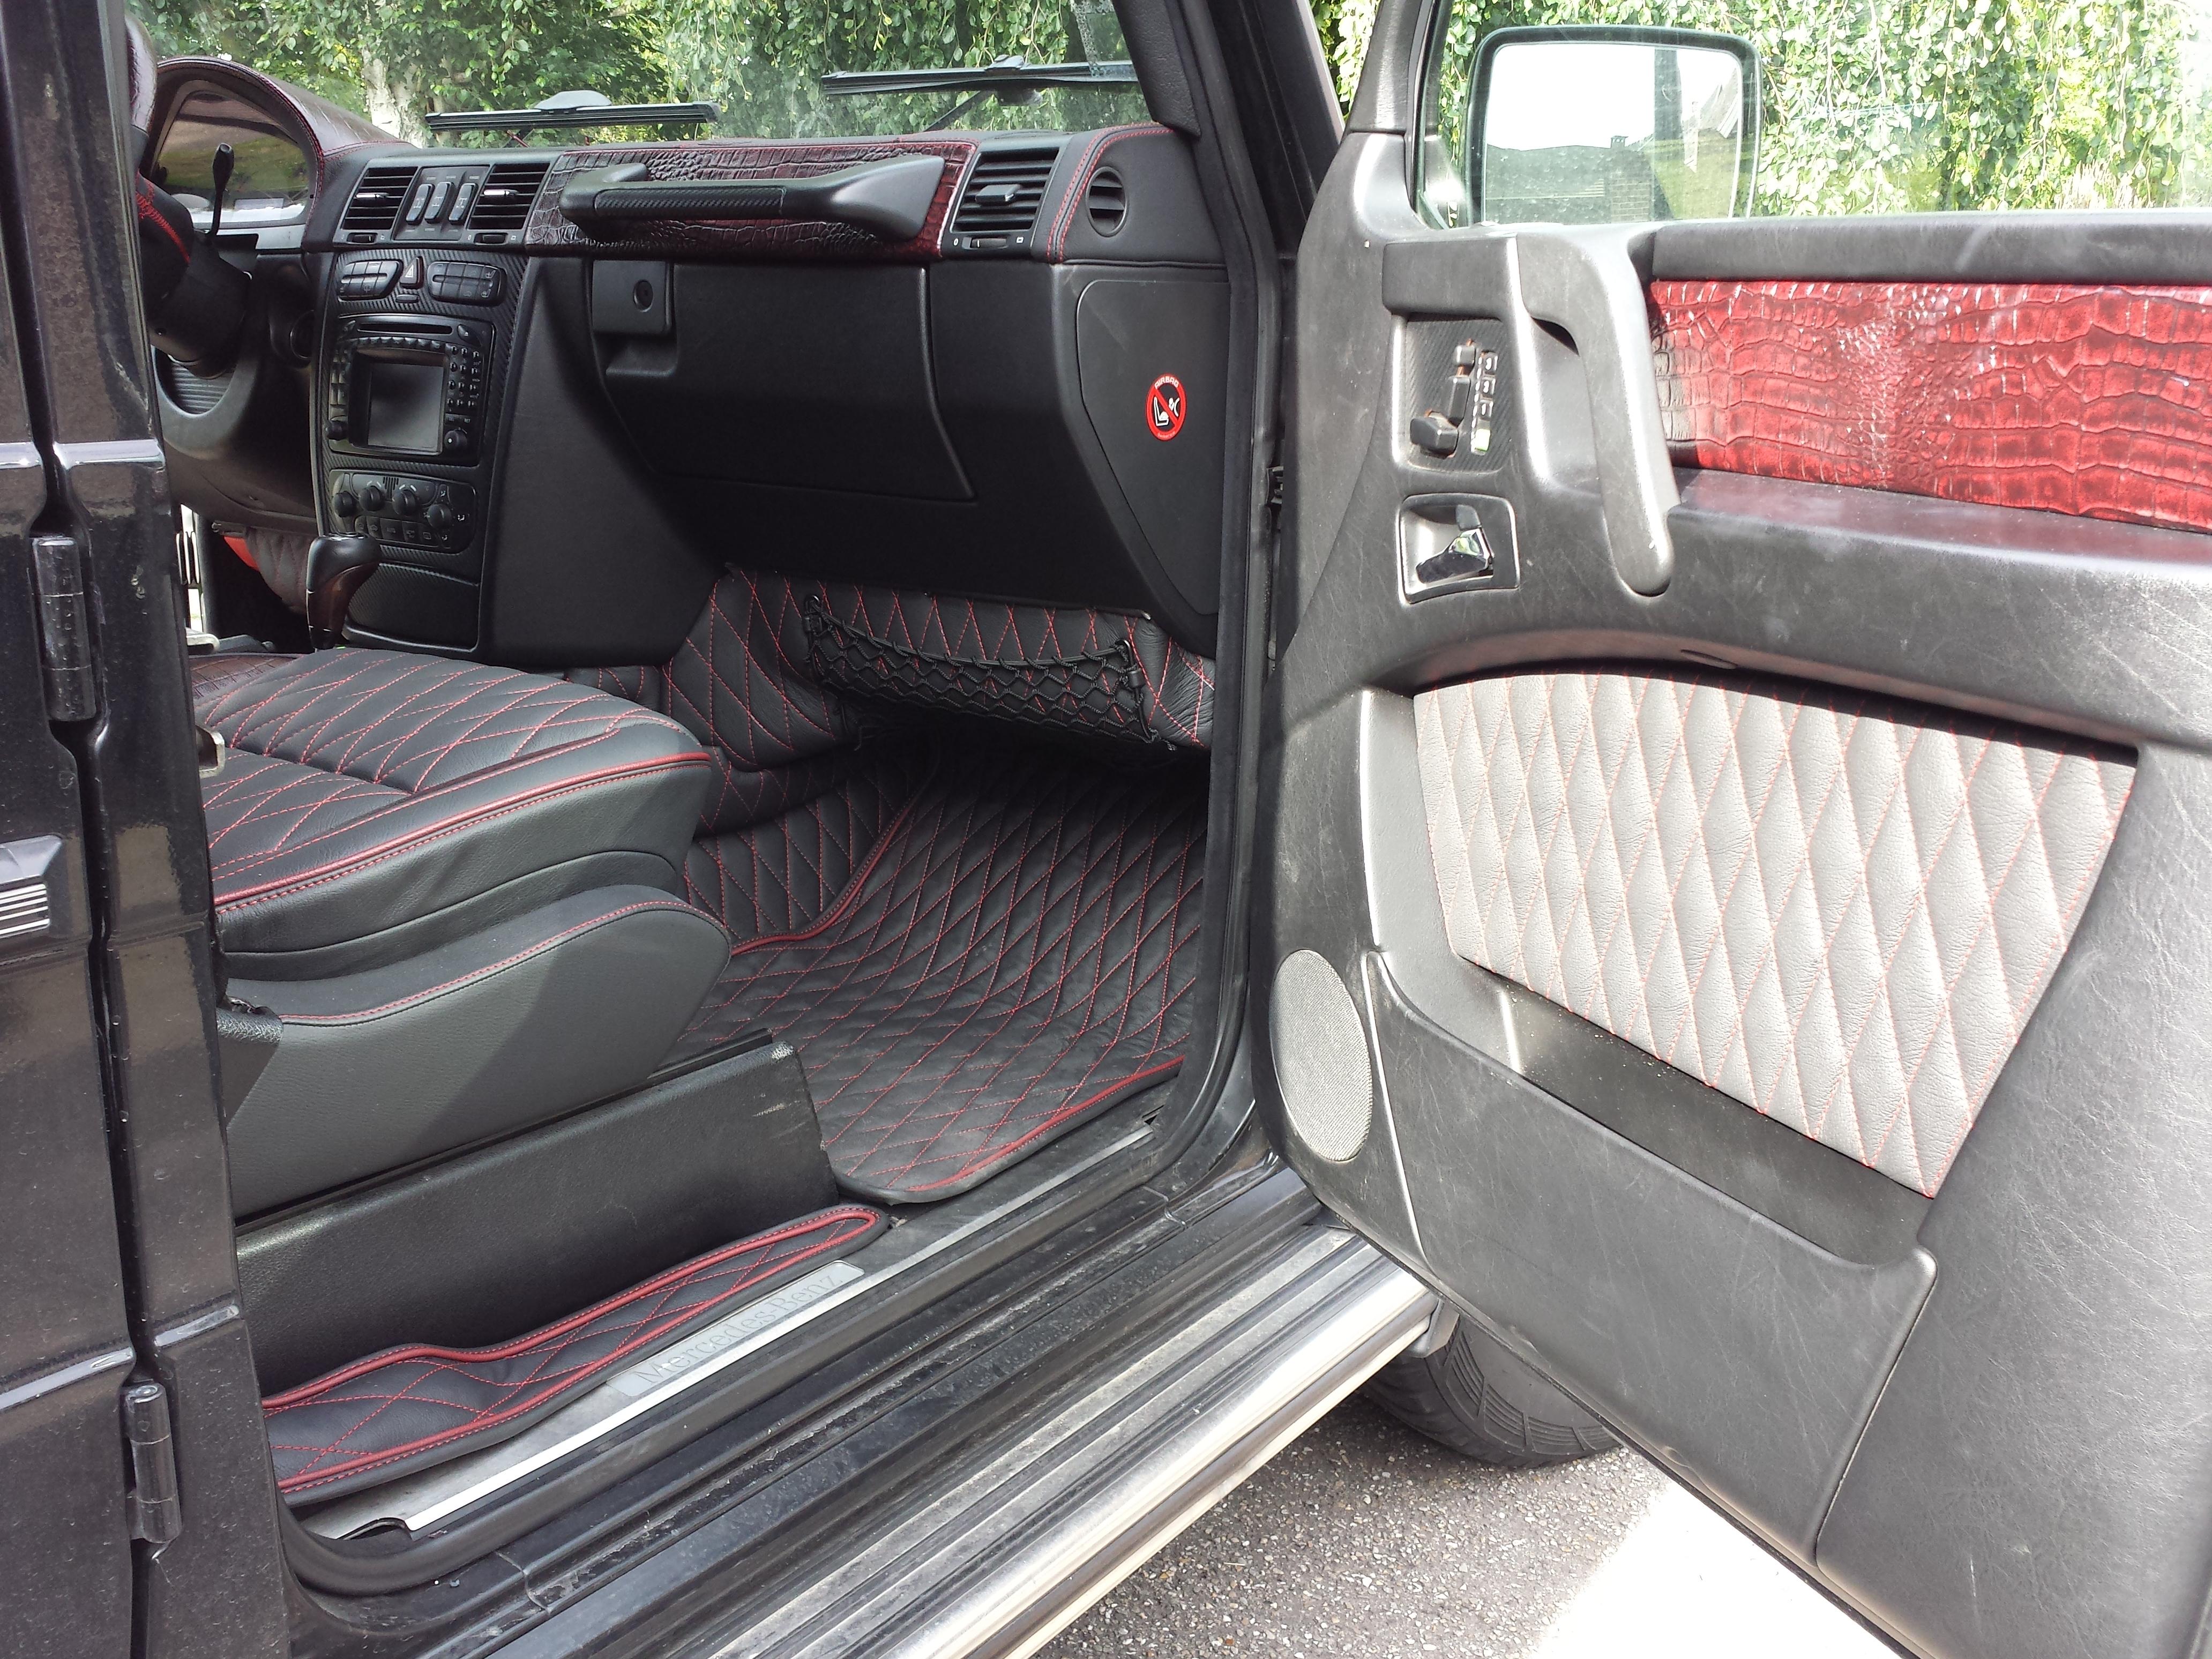 Corba design g wagon r r autobekleding for Interieur auto bekleden